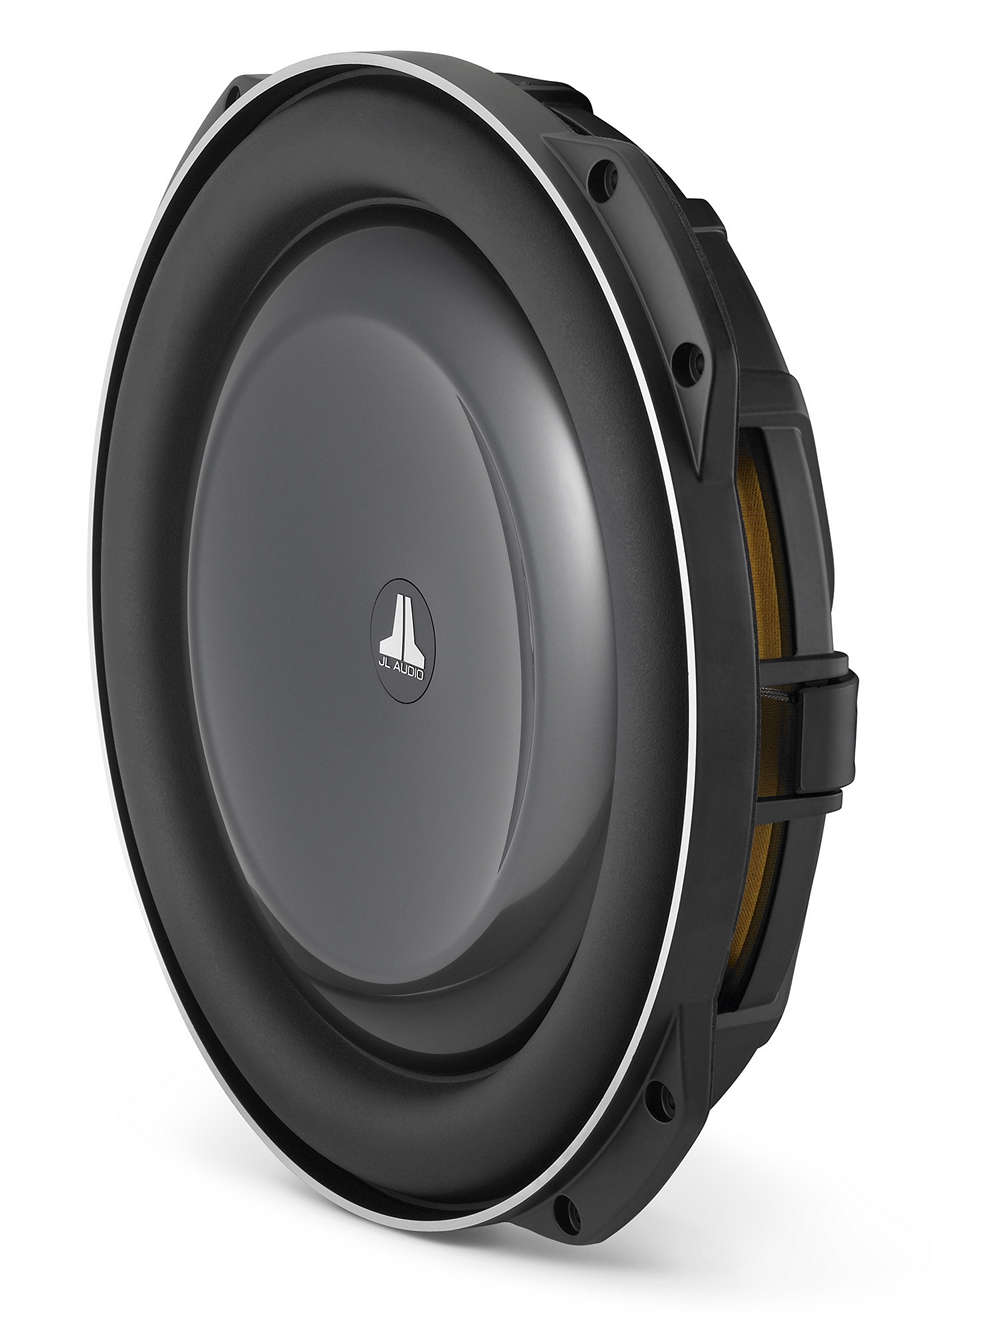 JL Audio 13TW5v2-4 | JL Audio | Subwoofer | ARS24.com